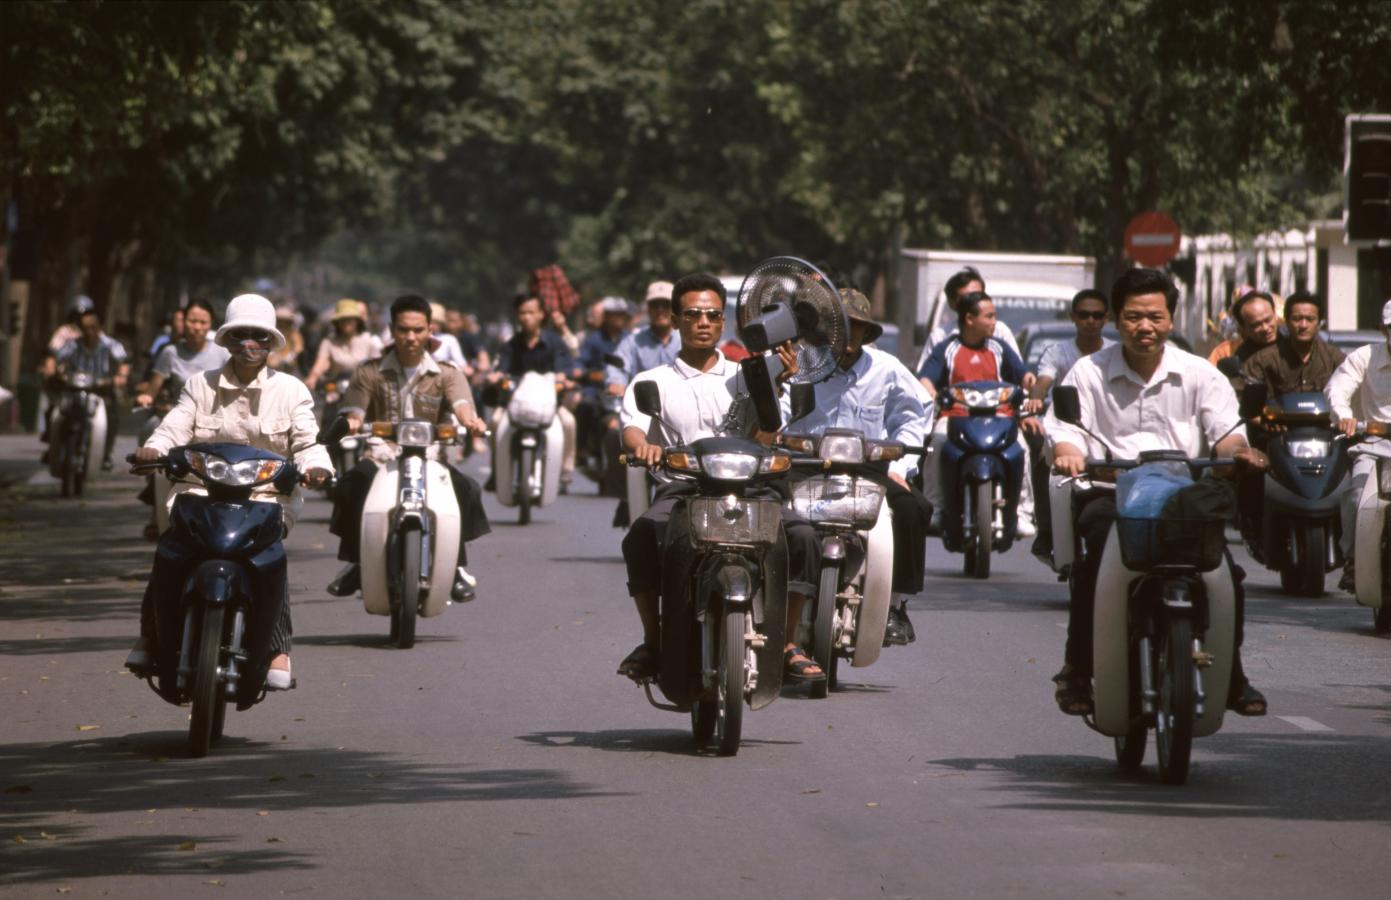 traffic-in-ho-chi-minh-city-(saigon)